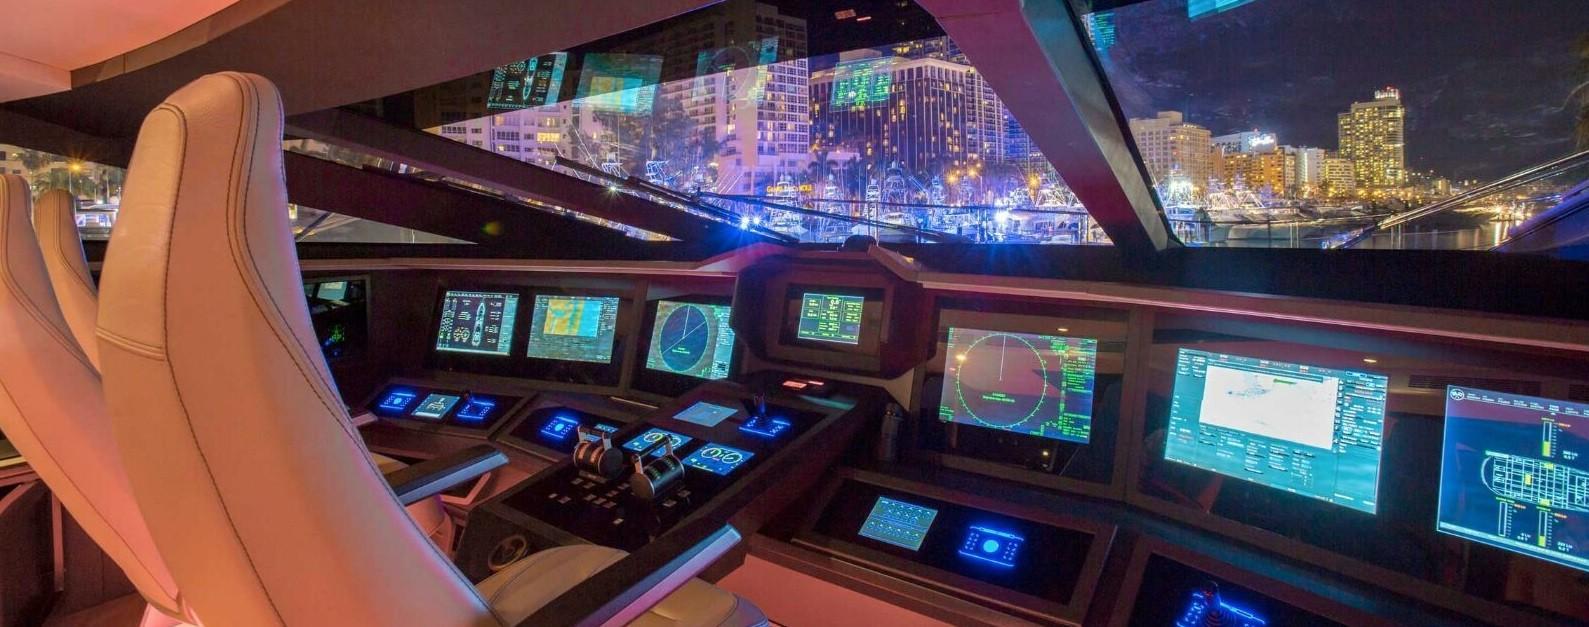 Praxis Automation Technology B.V. | LinkedIn